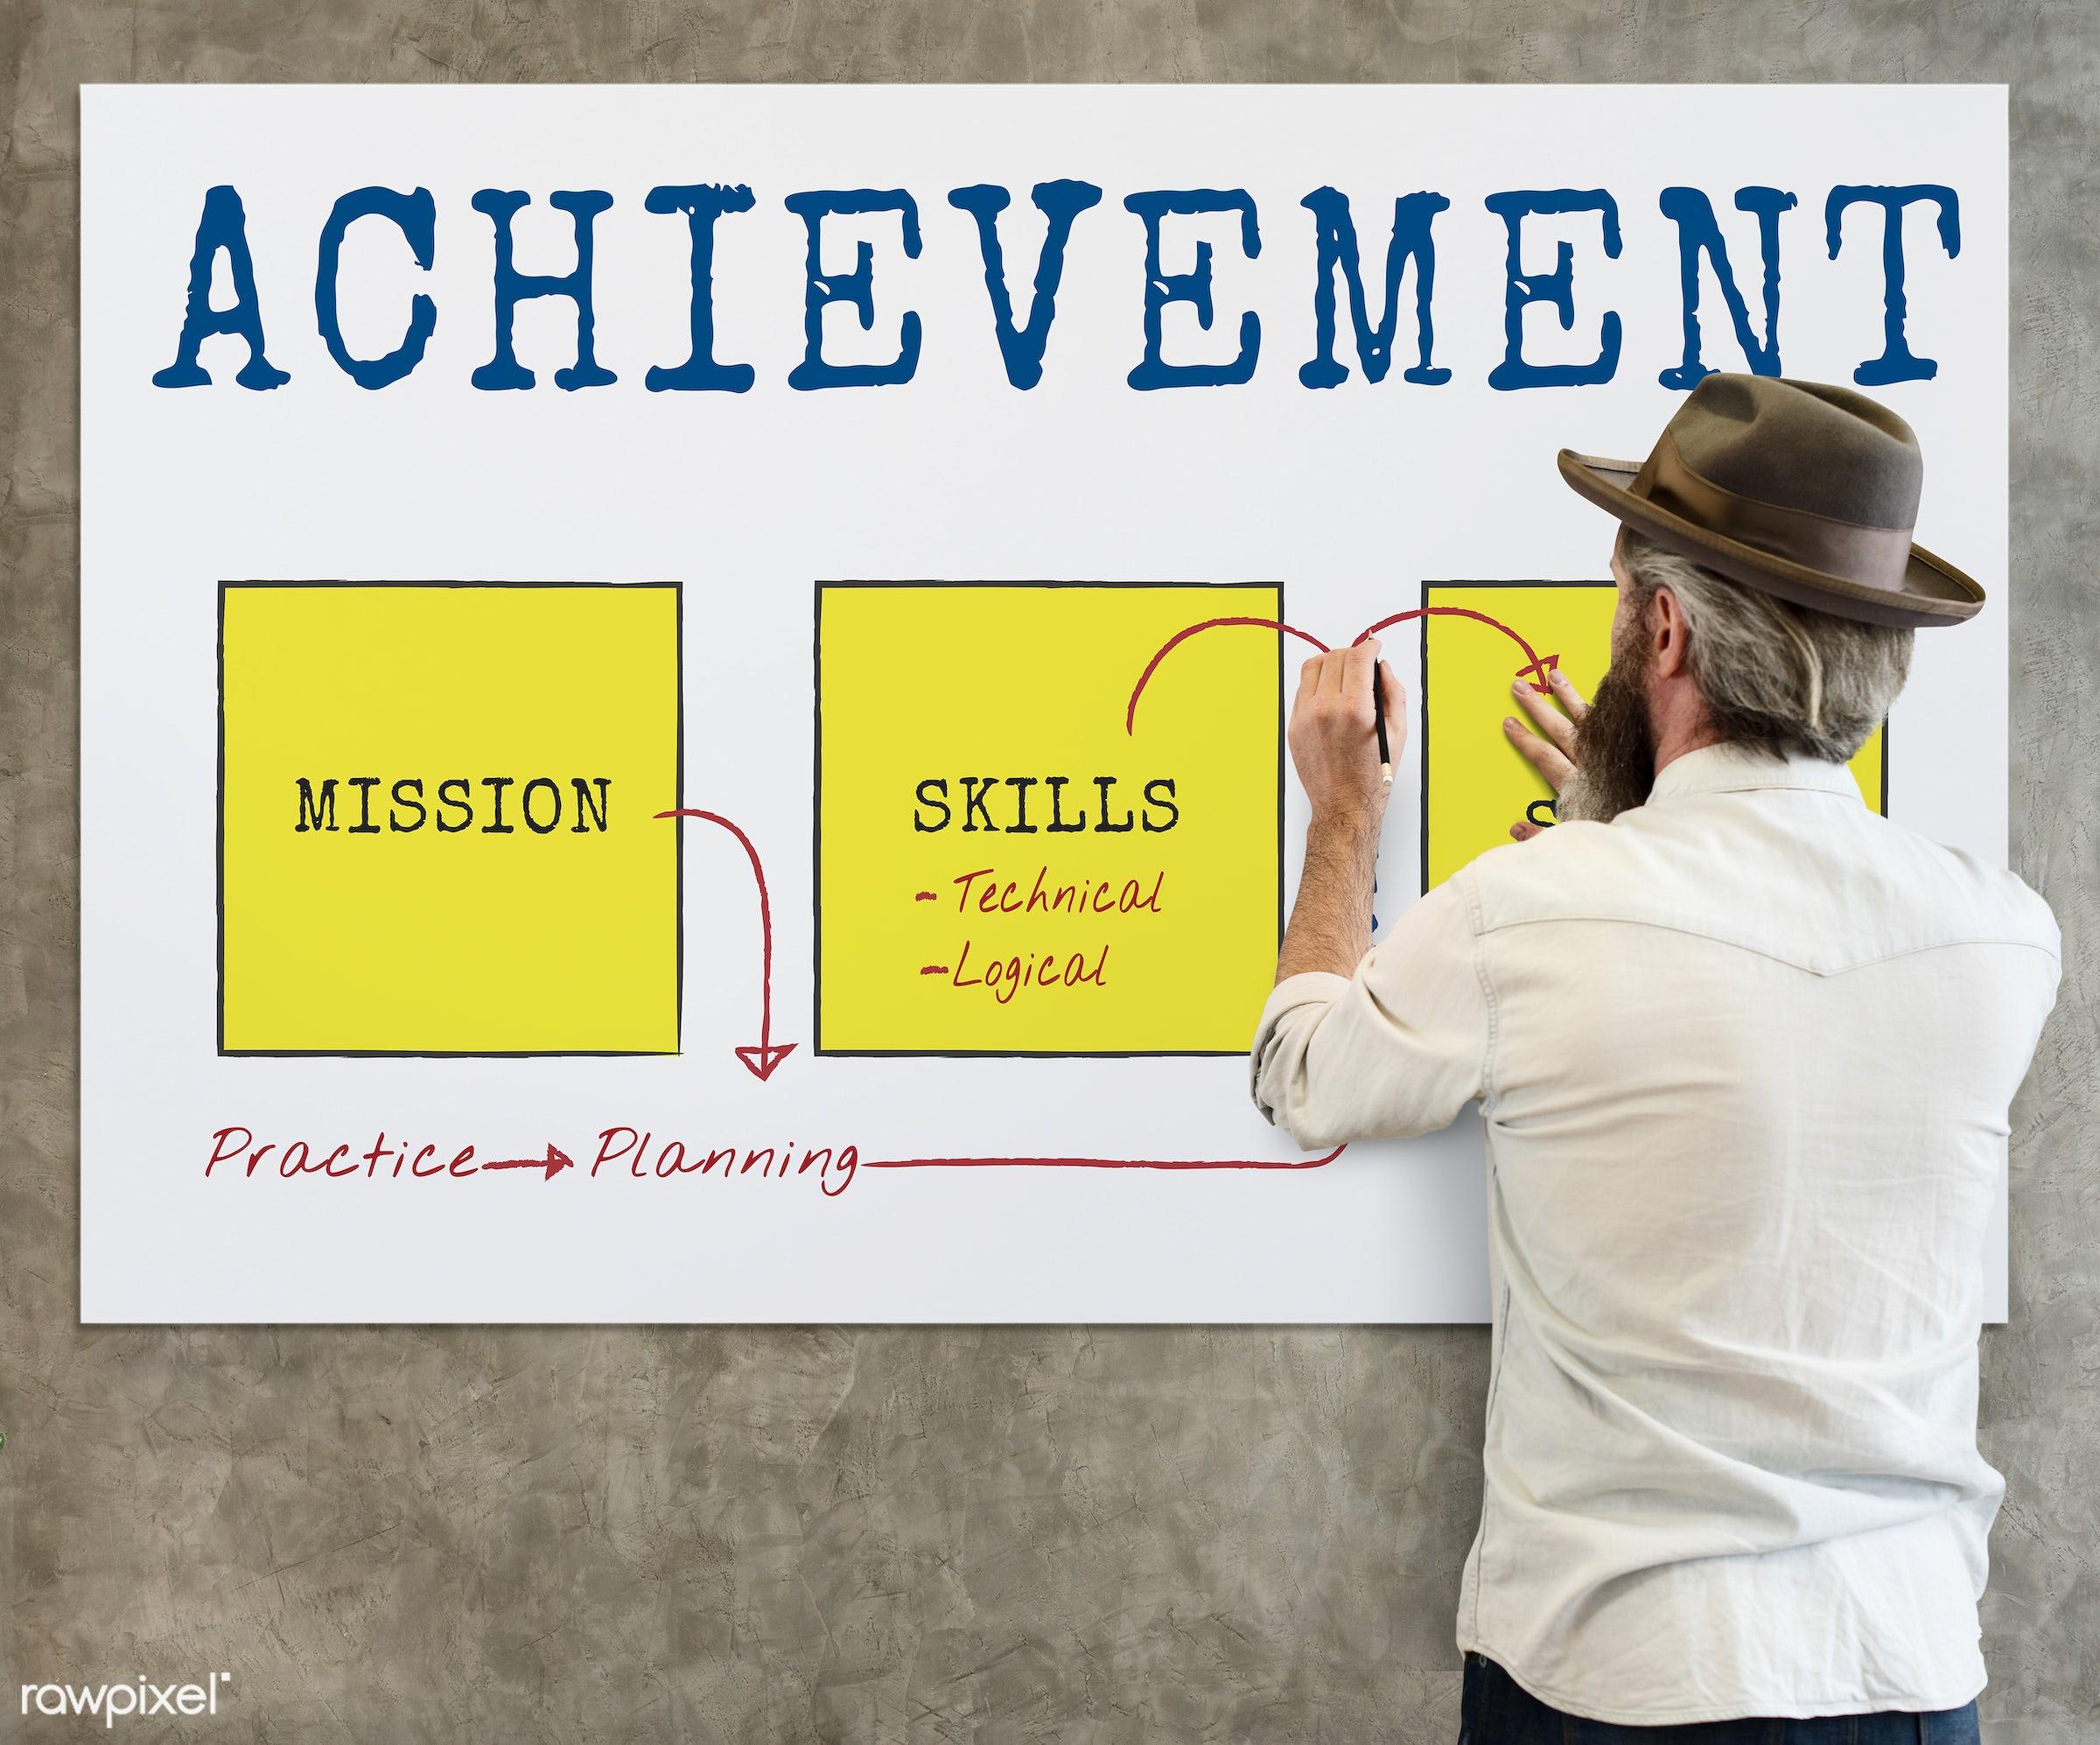 achievement, action, adult, alone, back, be creative, beard, beard guy, board, carefree, casual, ccomplishment, challenge,...